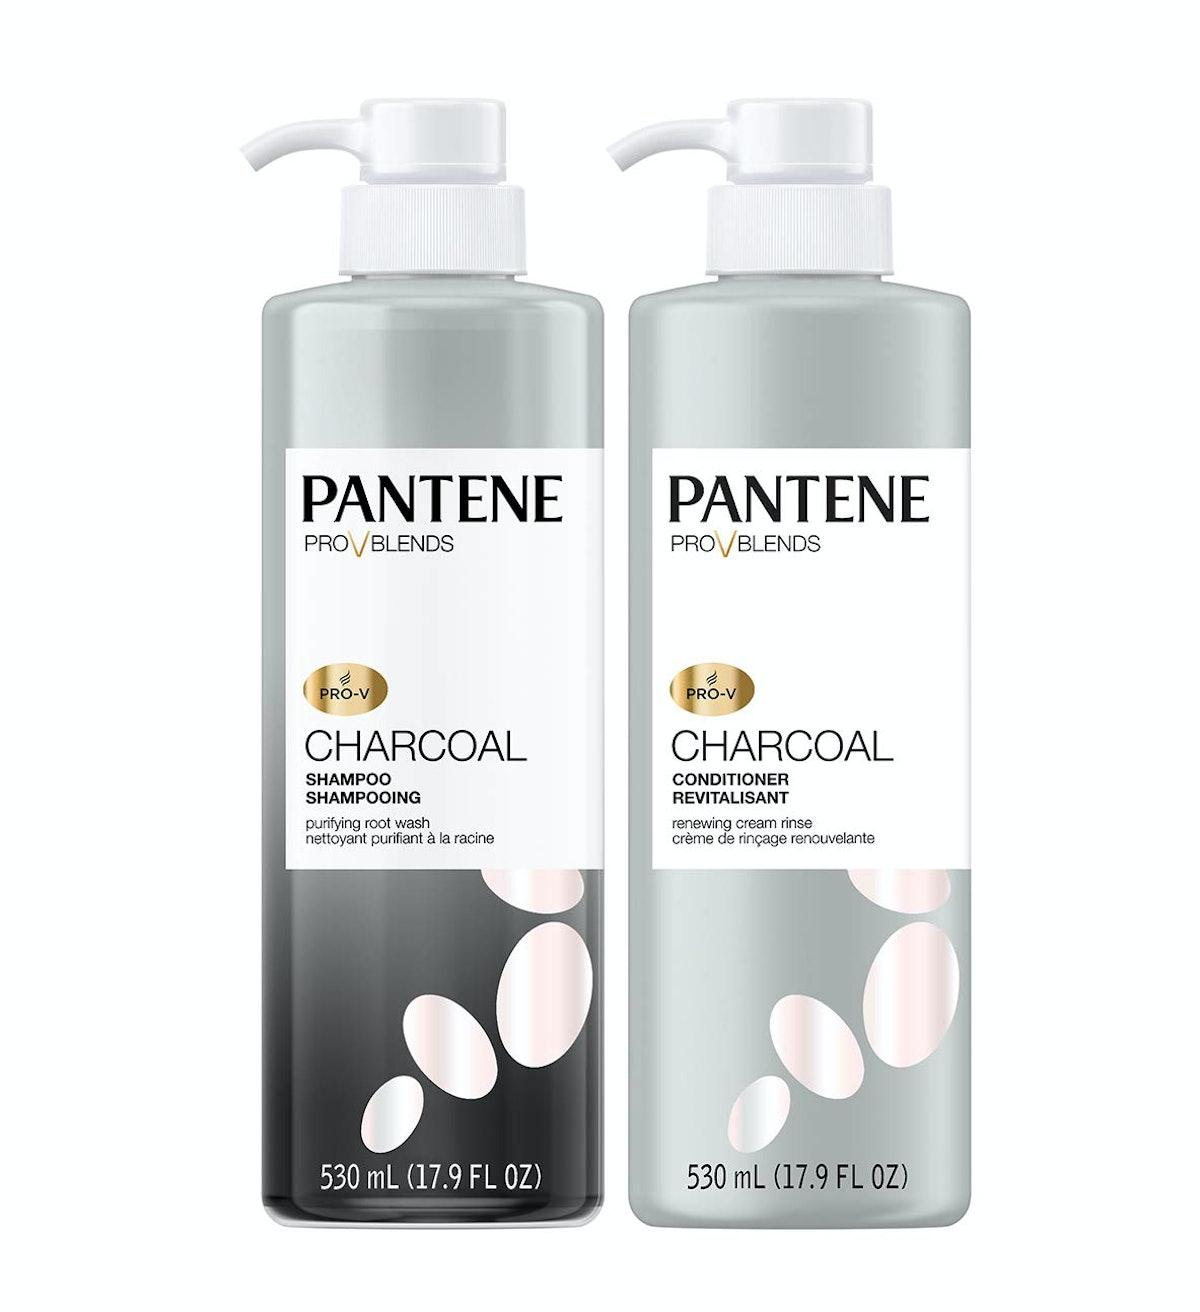 Pantene Charcoal Shampoo & Conditioner Set